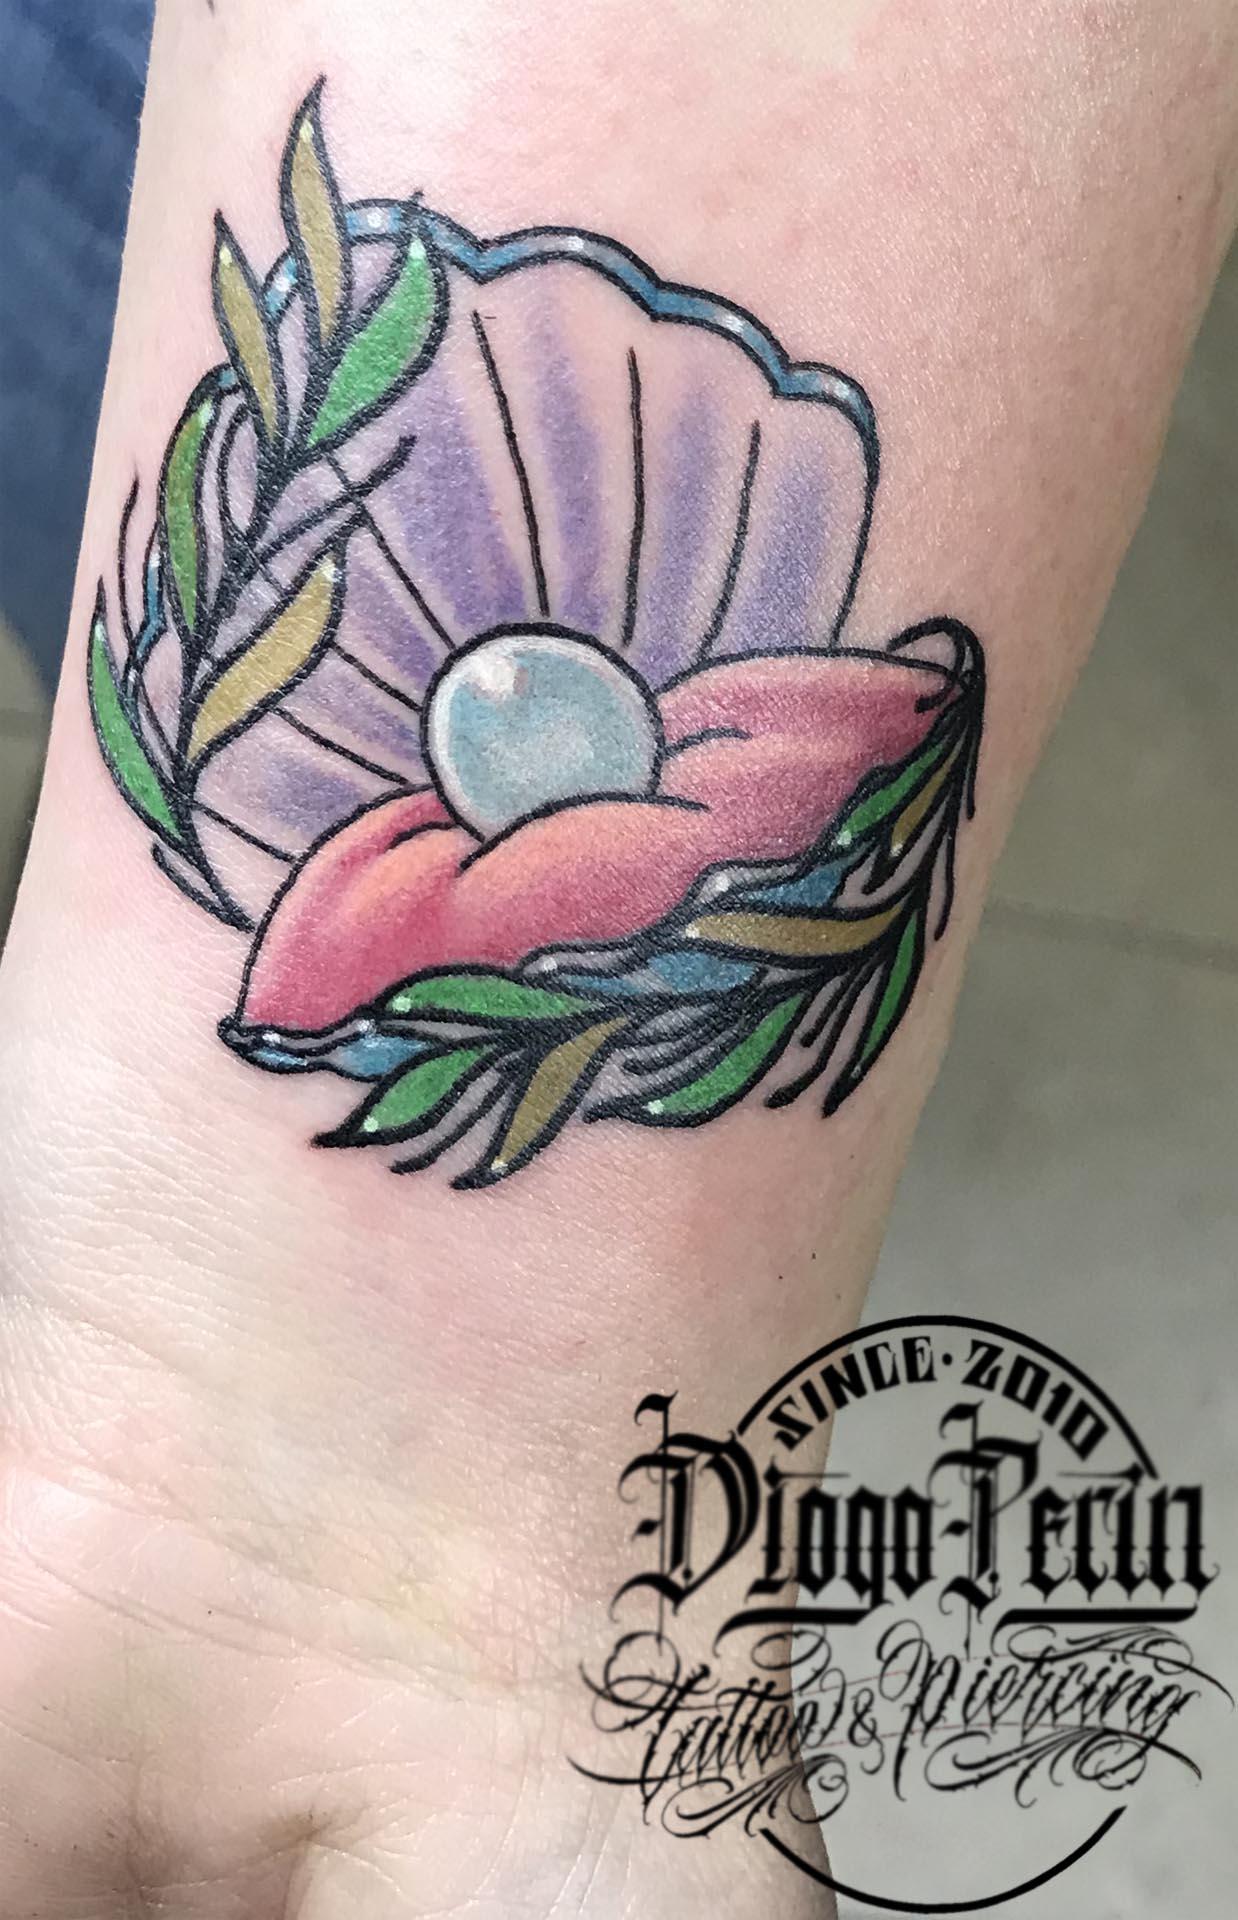 tattoo a color fullcolor ostra concha mar tatuaje alicante tatujes pequeños